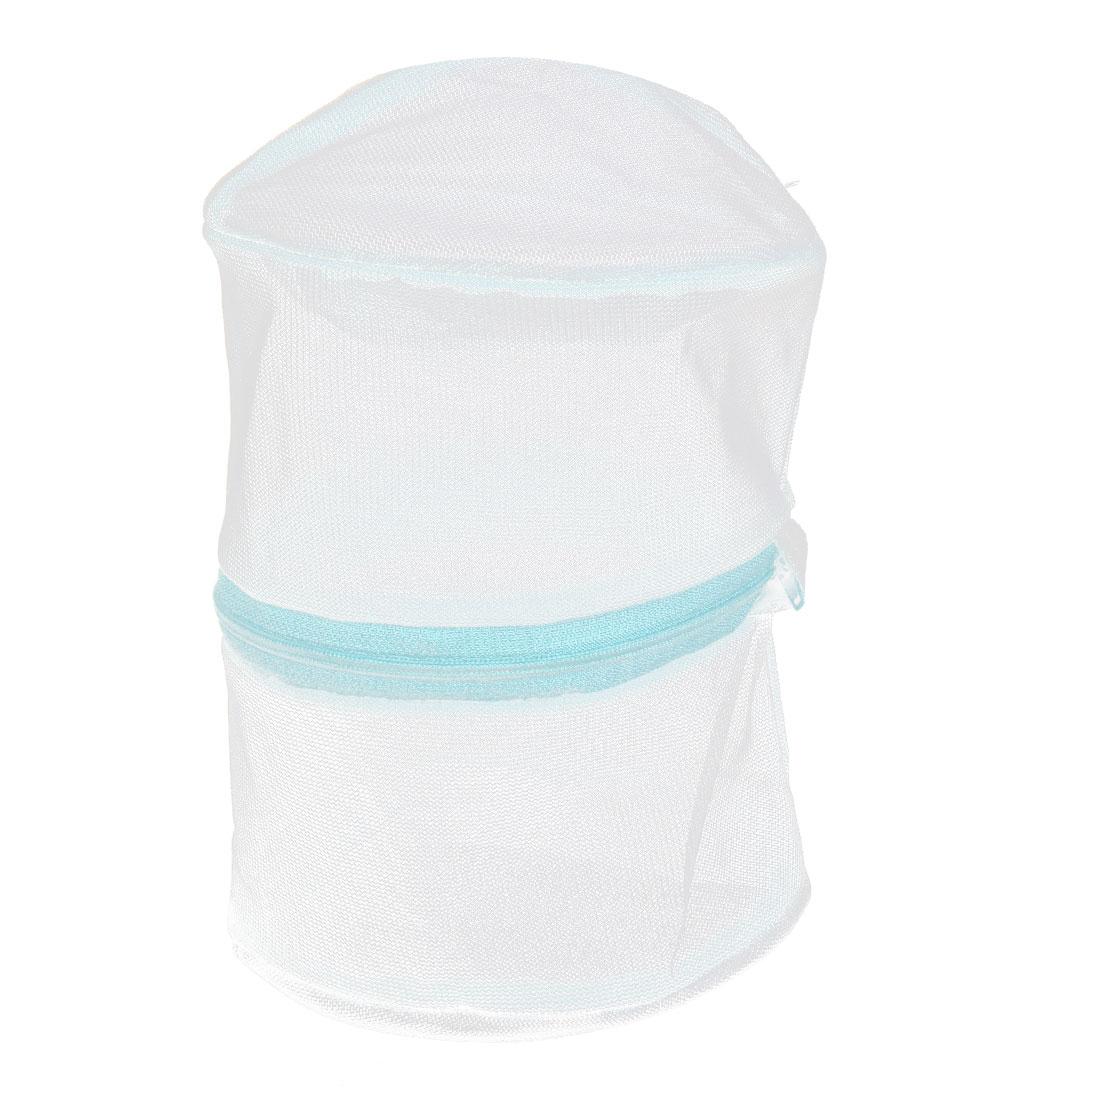 Green Net Mesh Basket Net Zipped Bra Underwear Socks Bag Laundry Washing Machine Nylon